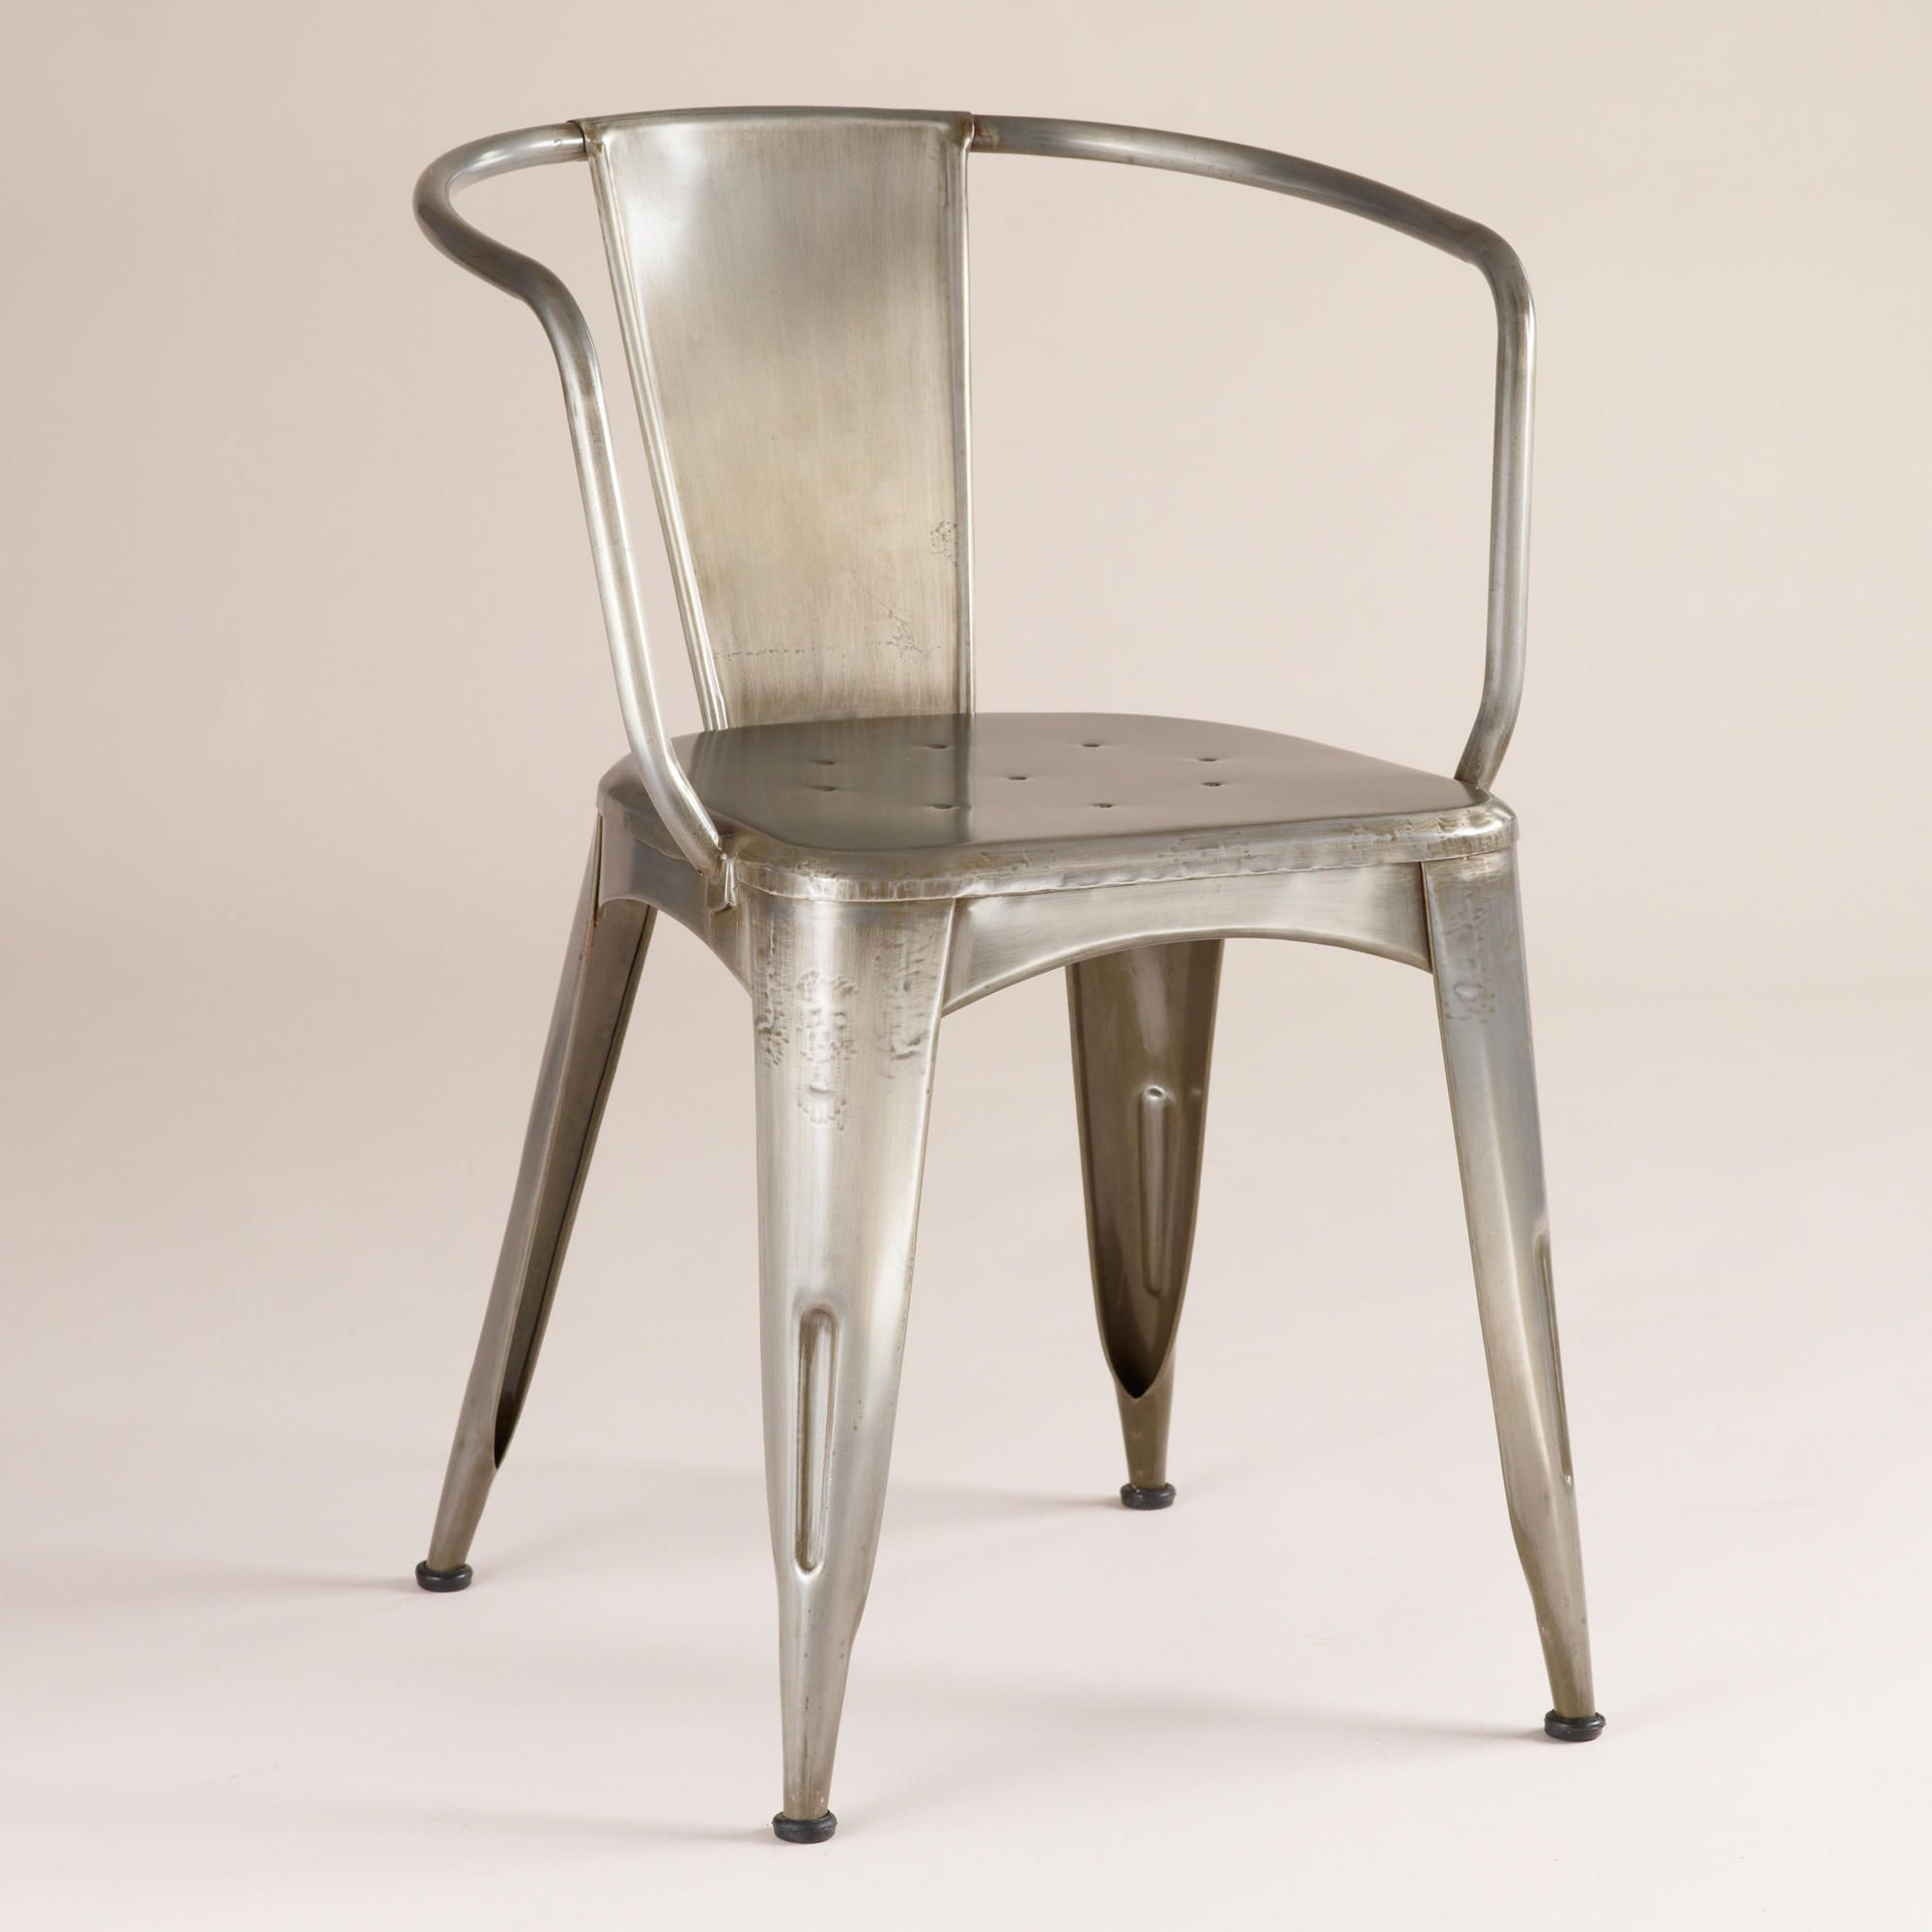 Metal Tub Chairs Chair Nordic Design Jackson World Market 109 99 Home Love